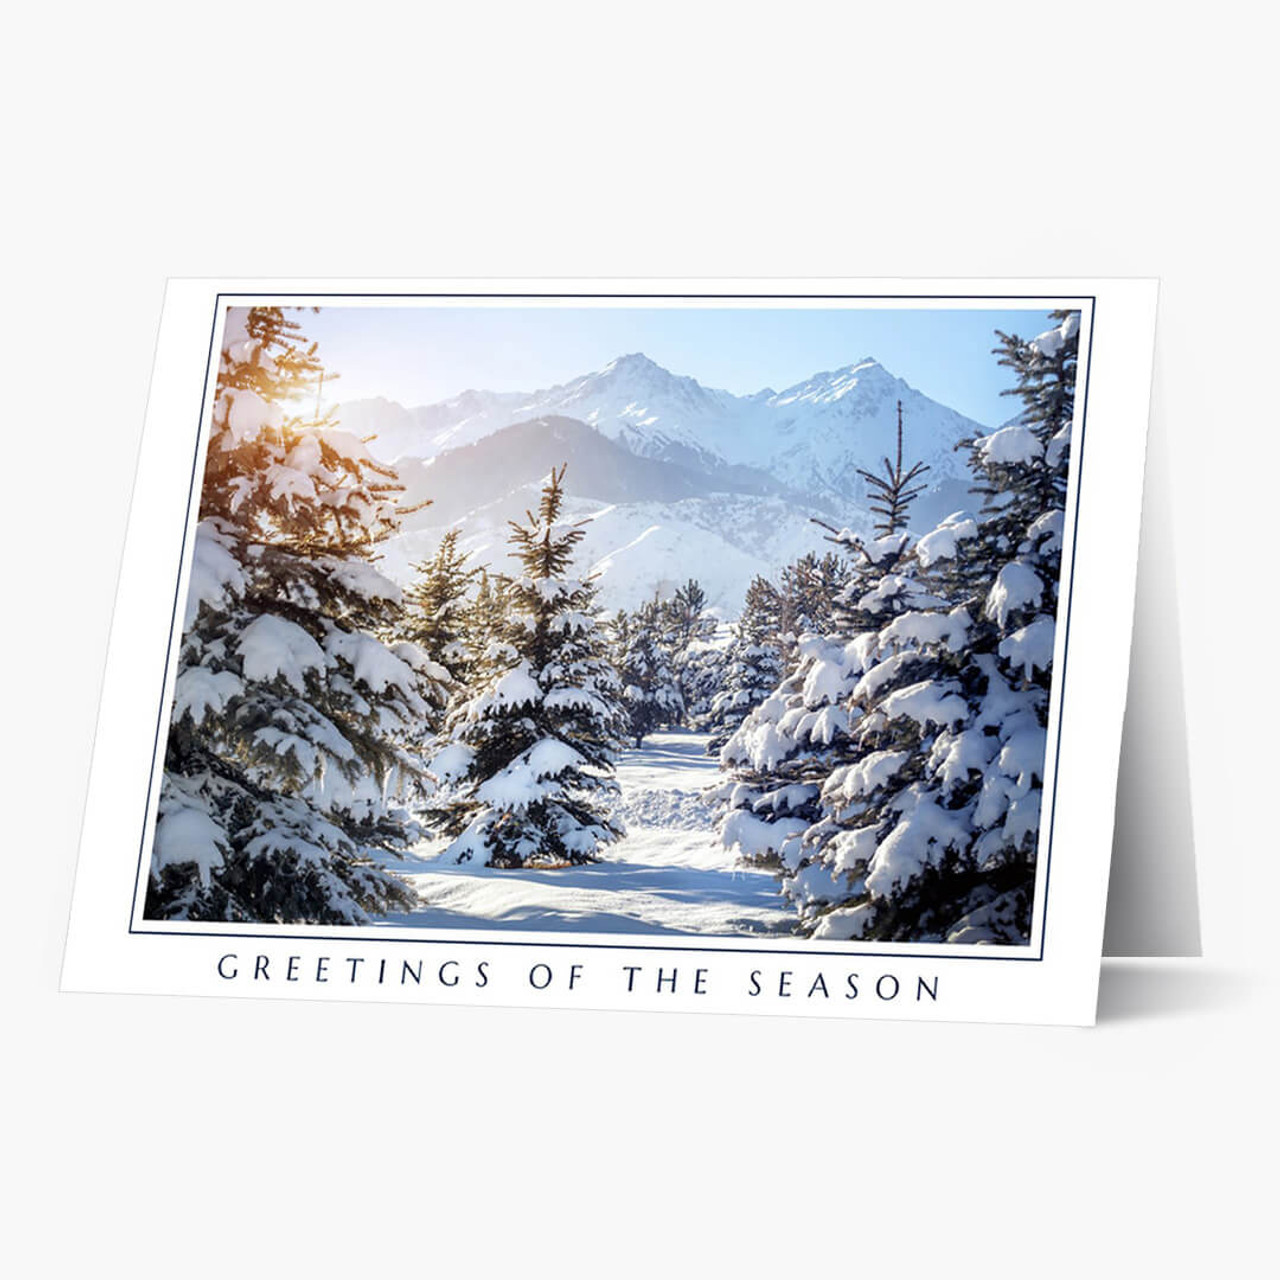 A Majestic Season Christmas Card